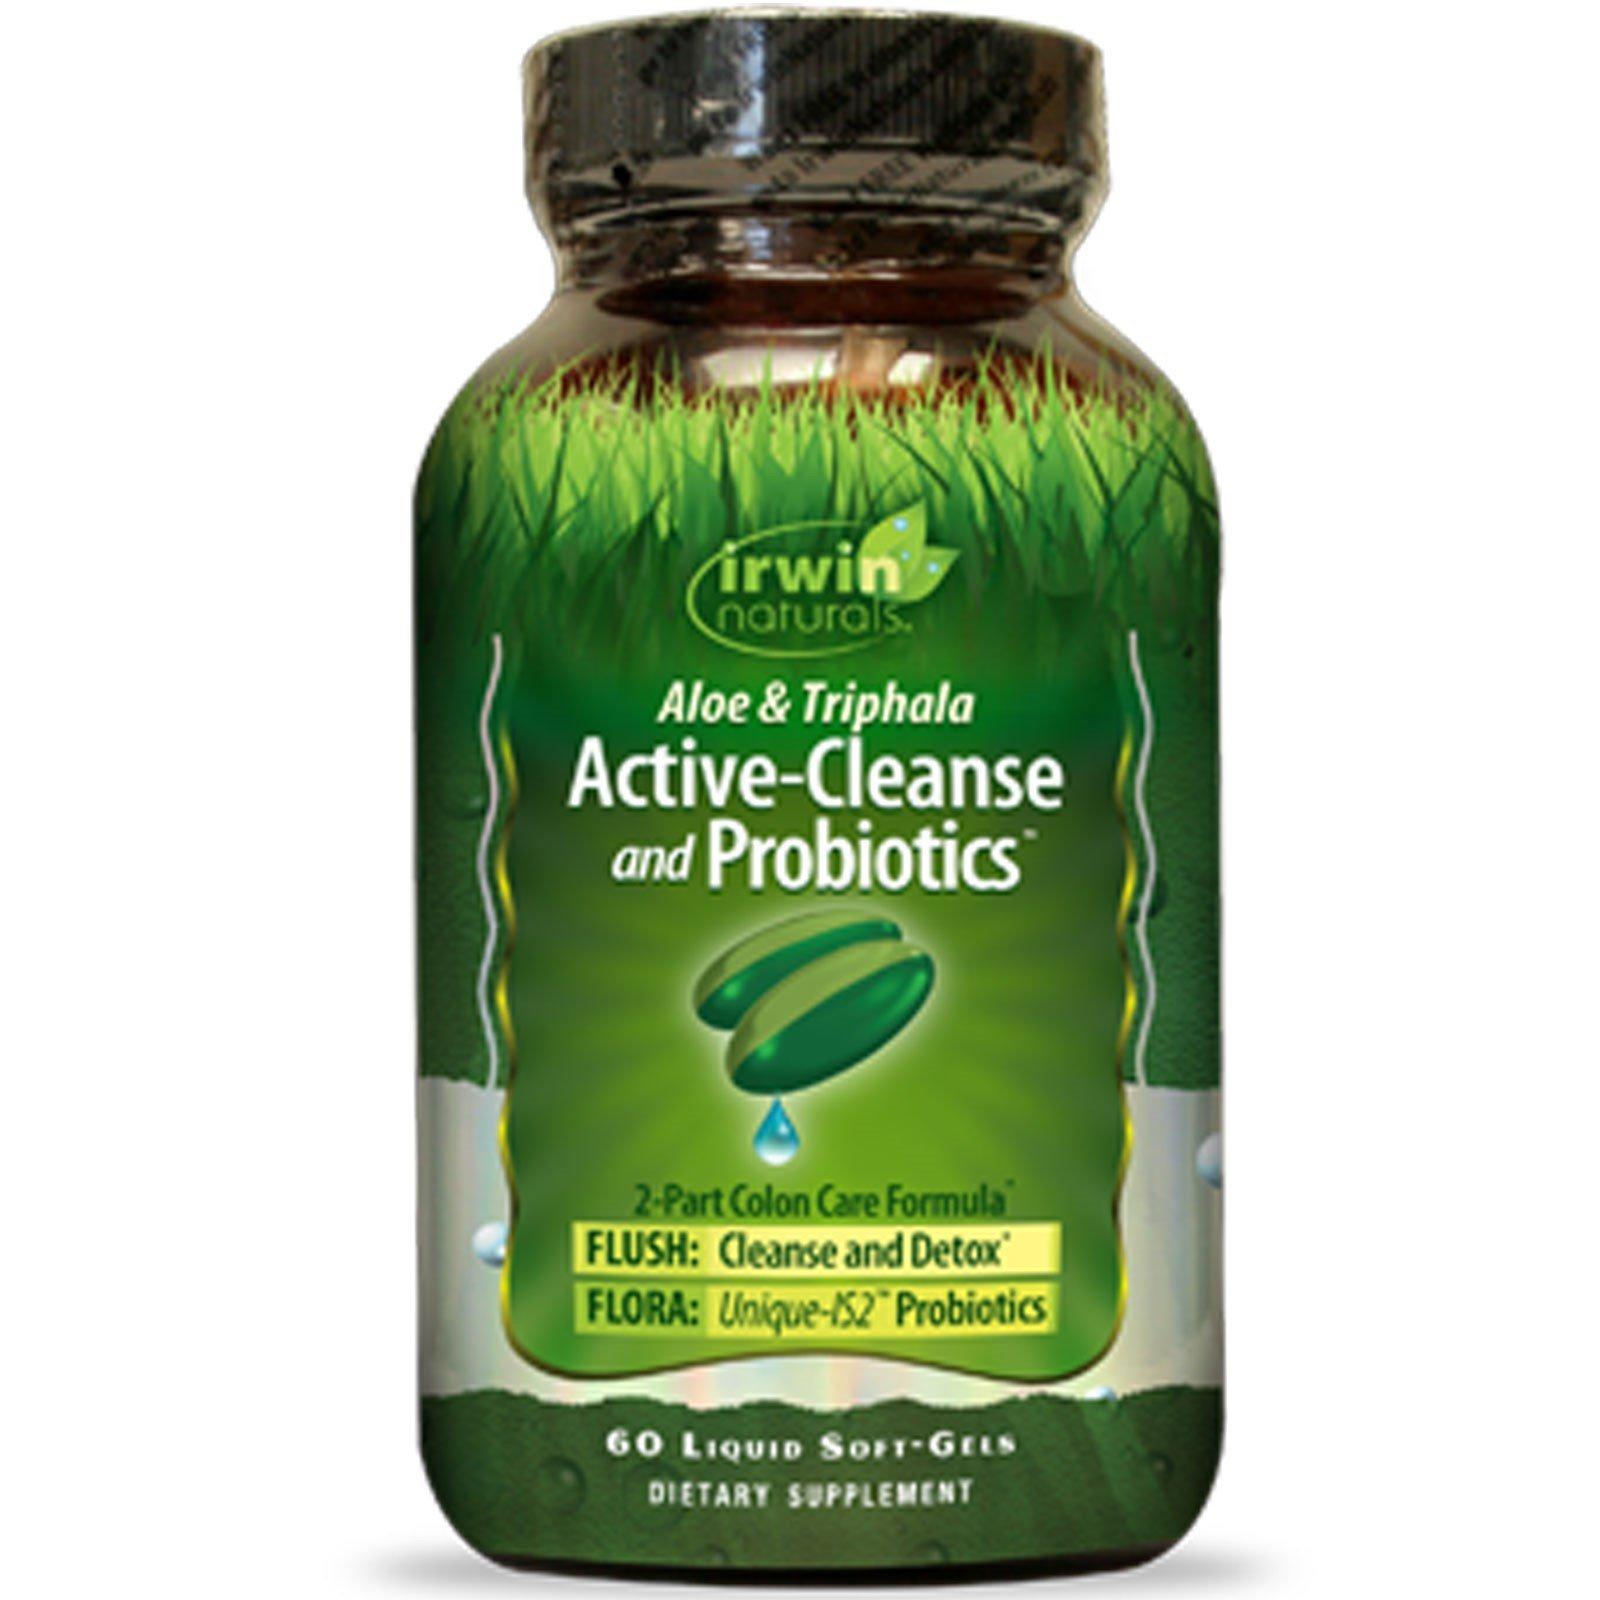 Aloe and Triphala Active-Cleanse and Probiotics by Irwin Naturals, 2-Part Colon Care Formula Detox, 60 Liquid Soft-Gels, 2 Pack